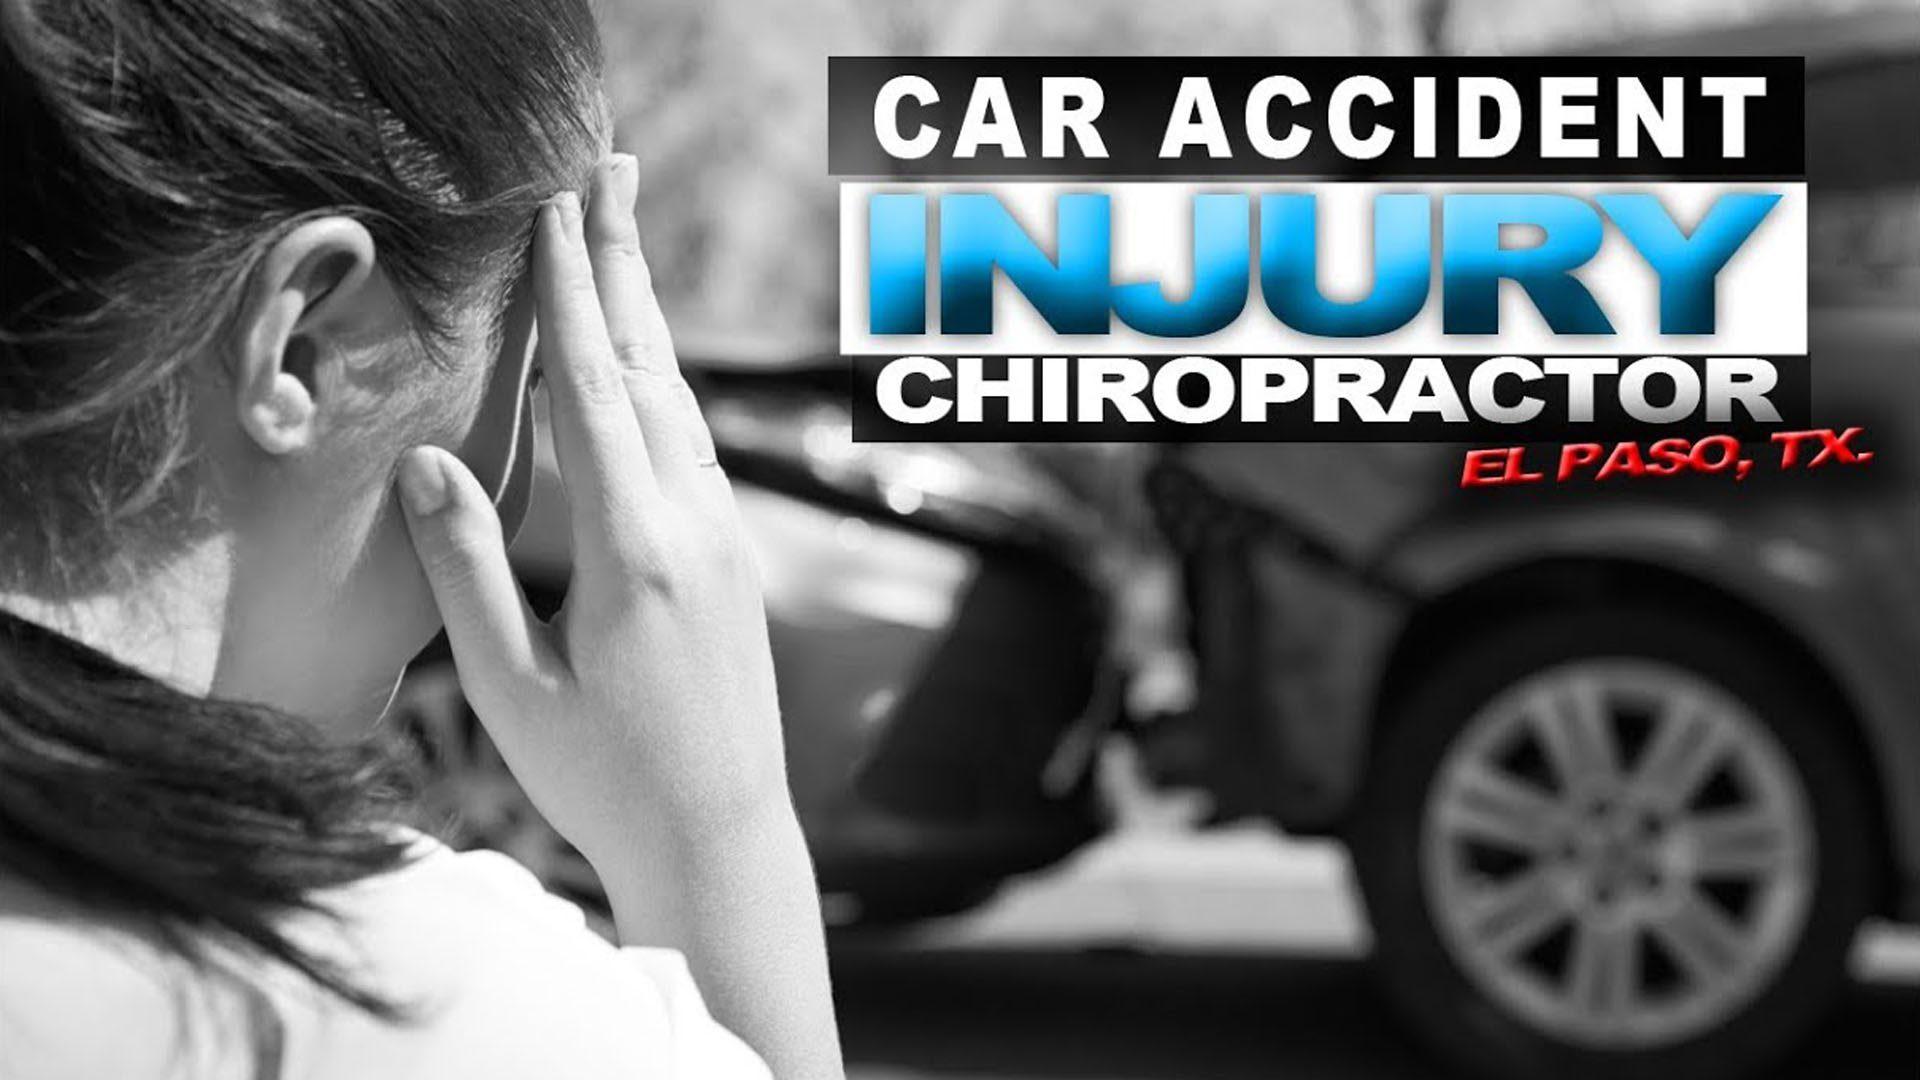 chiropractic help auto accidents el paso tx.